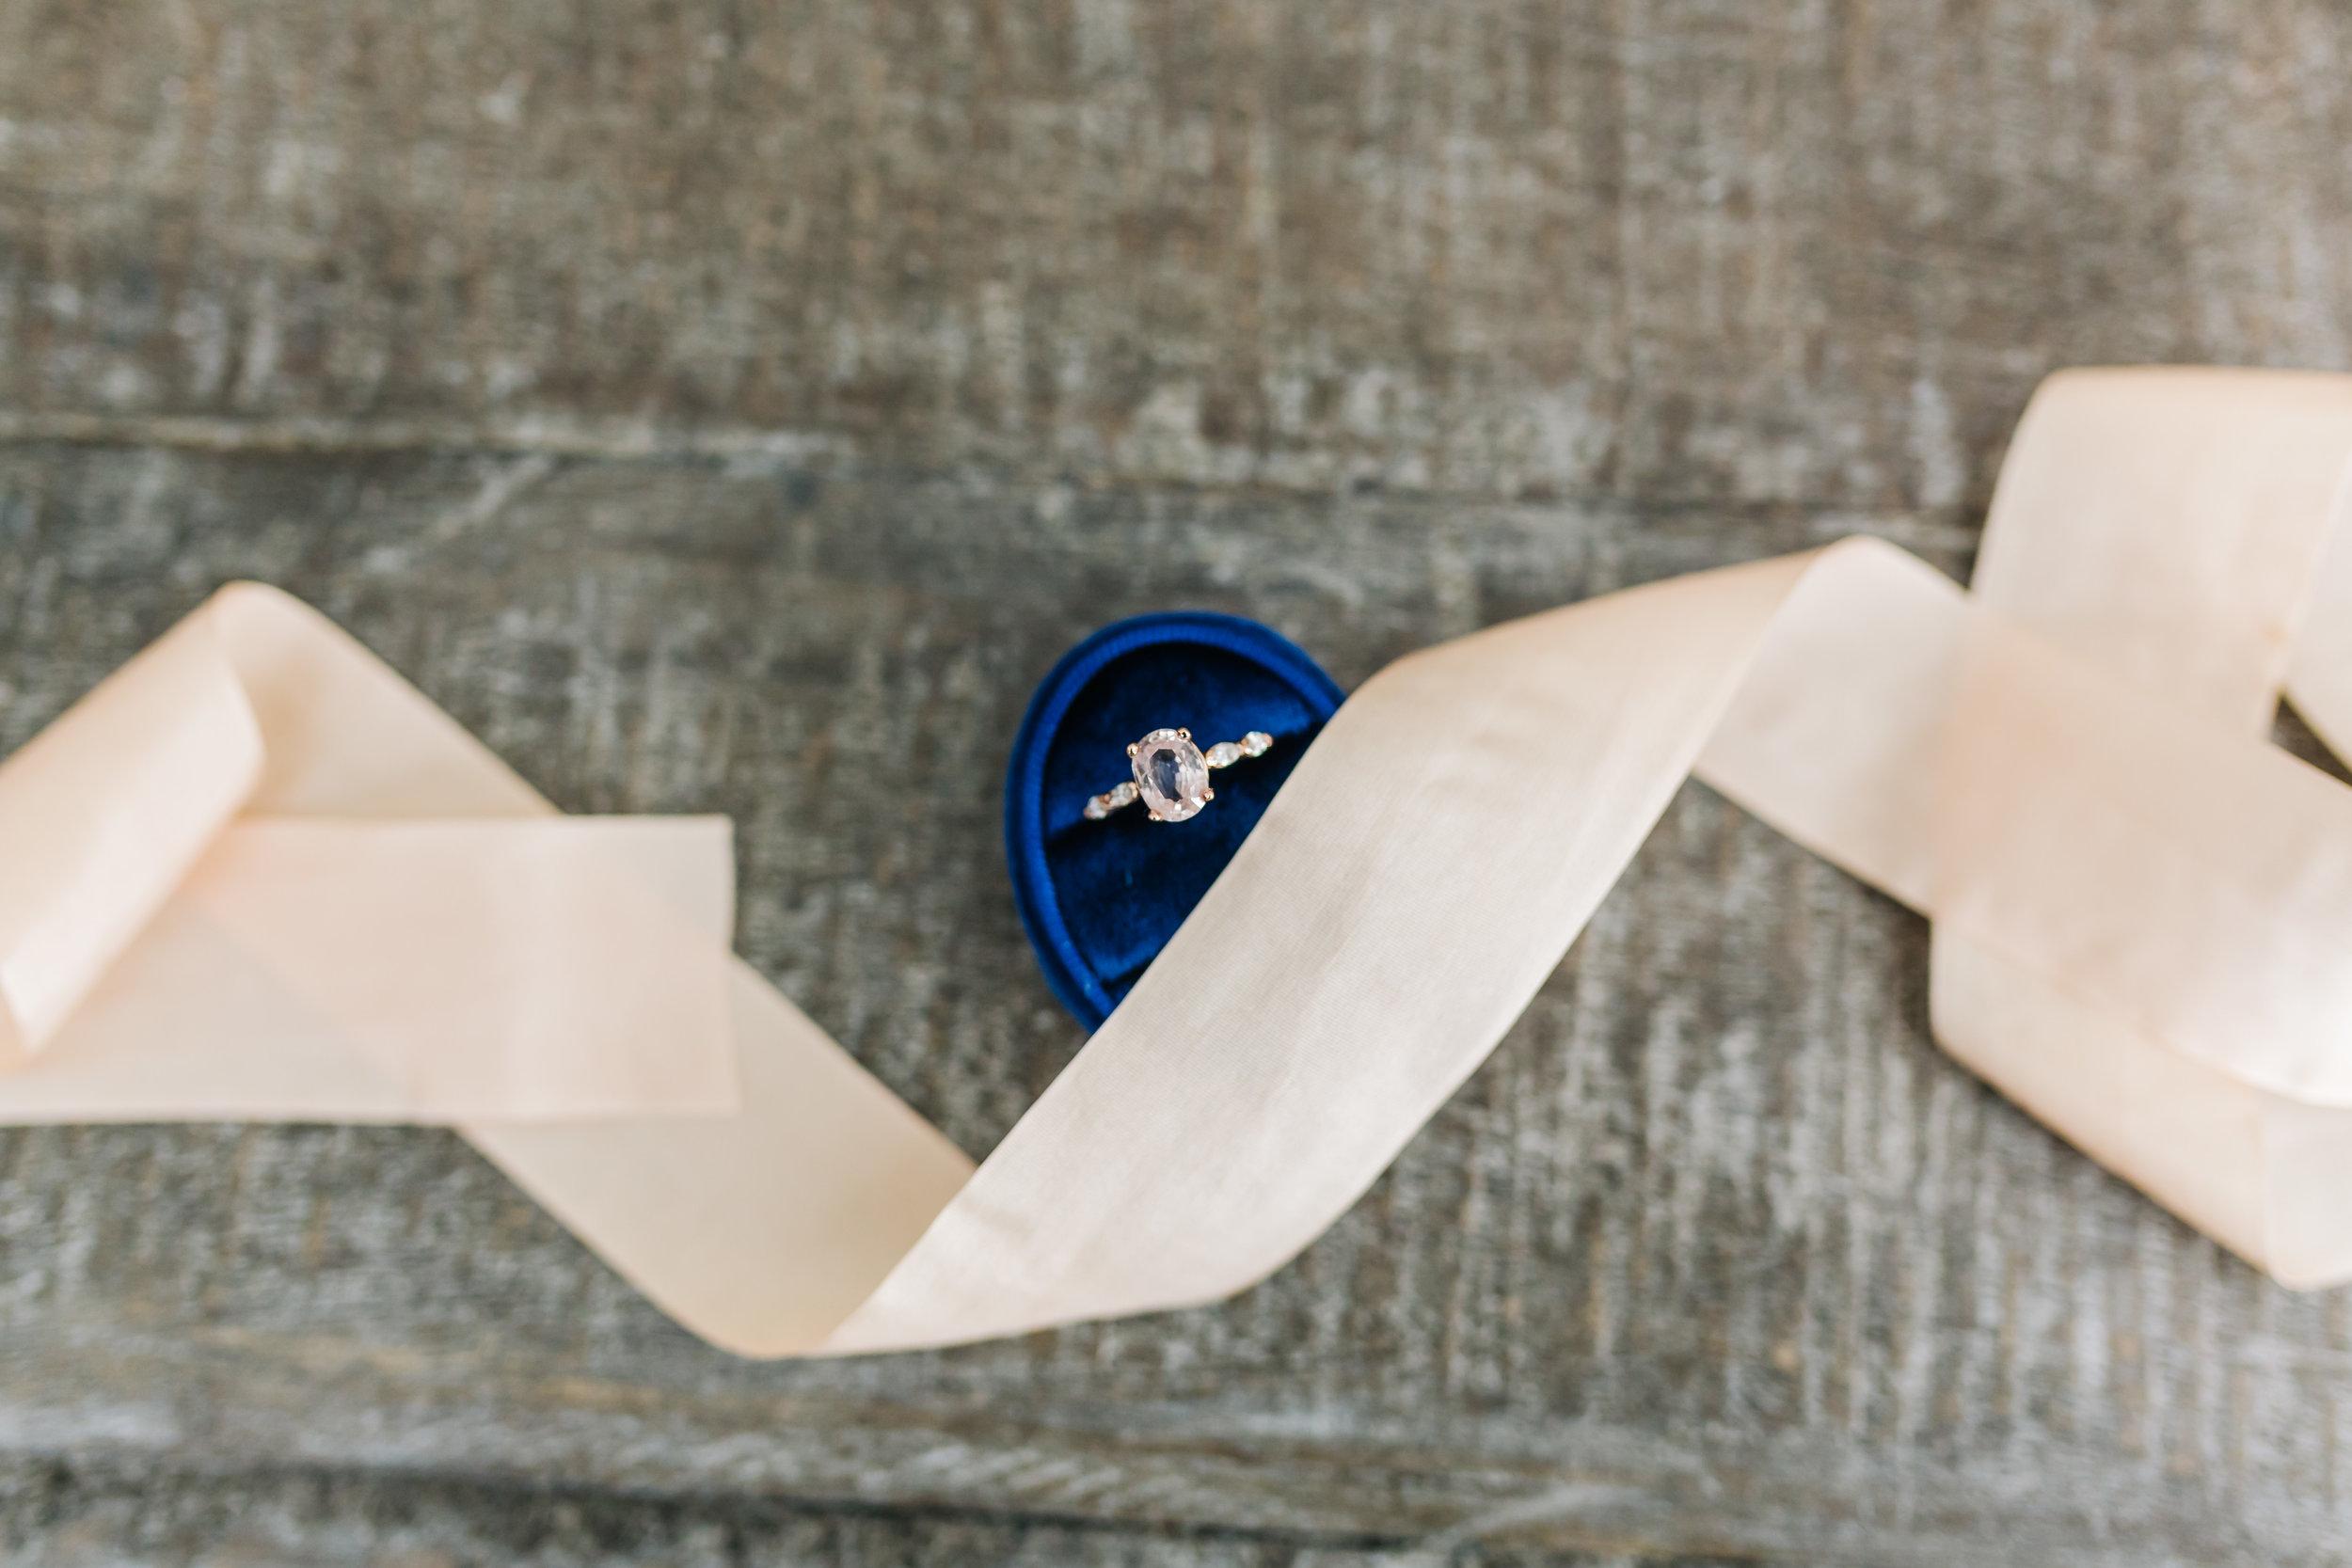 2018.09.02 Ray and Sarah Prizner Nashville TN Wedding FINALS-9.jpg